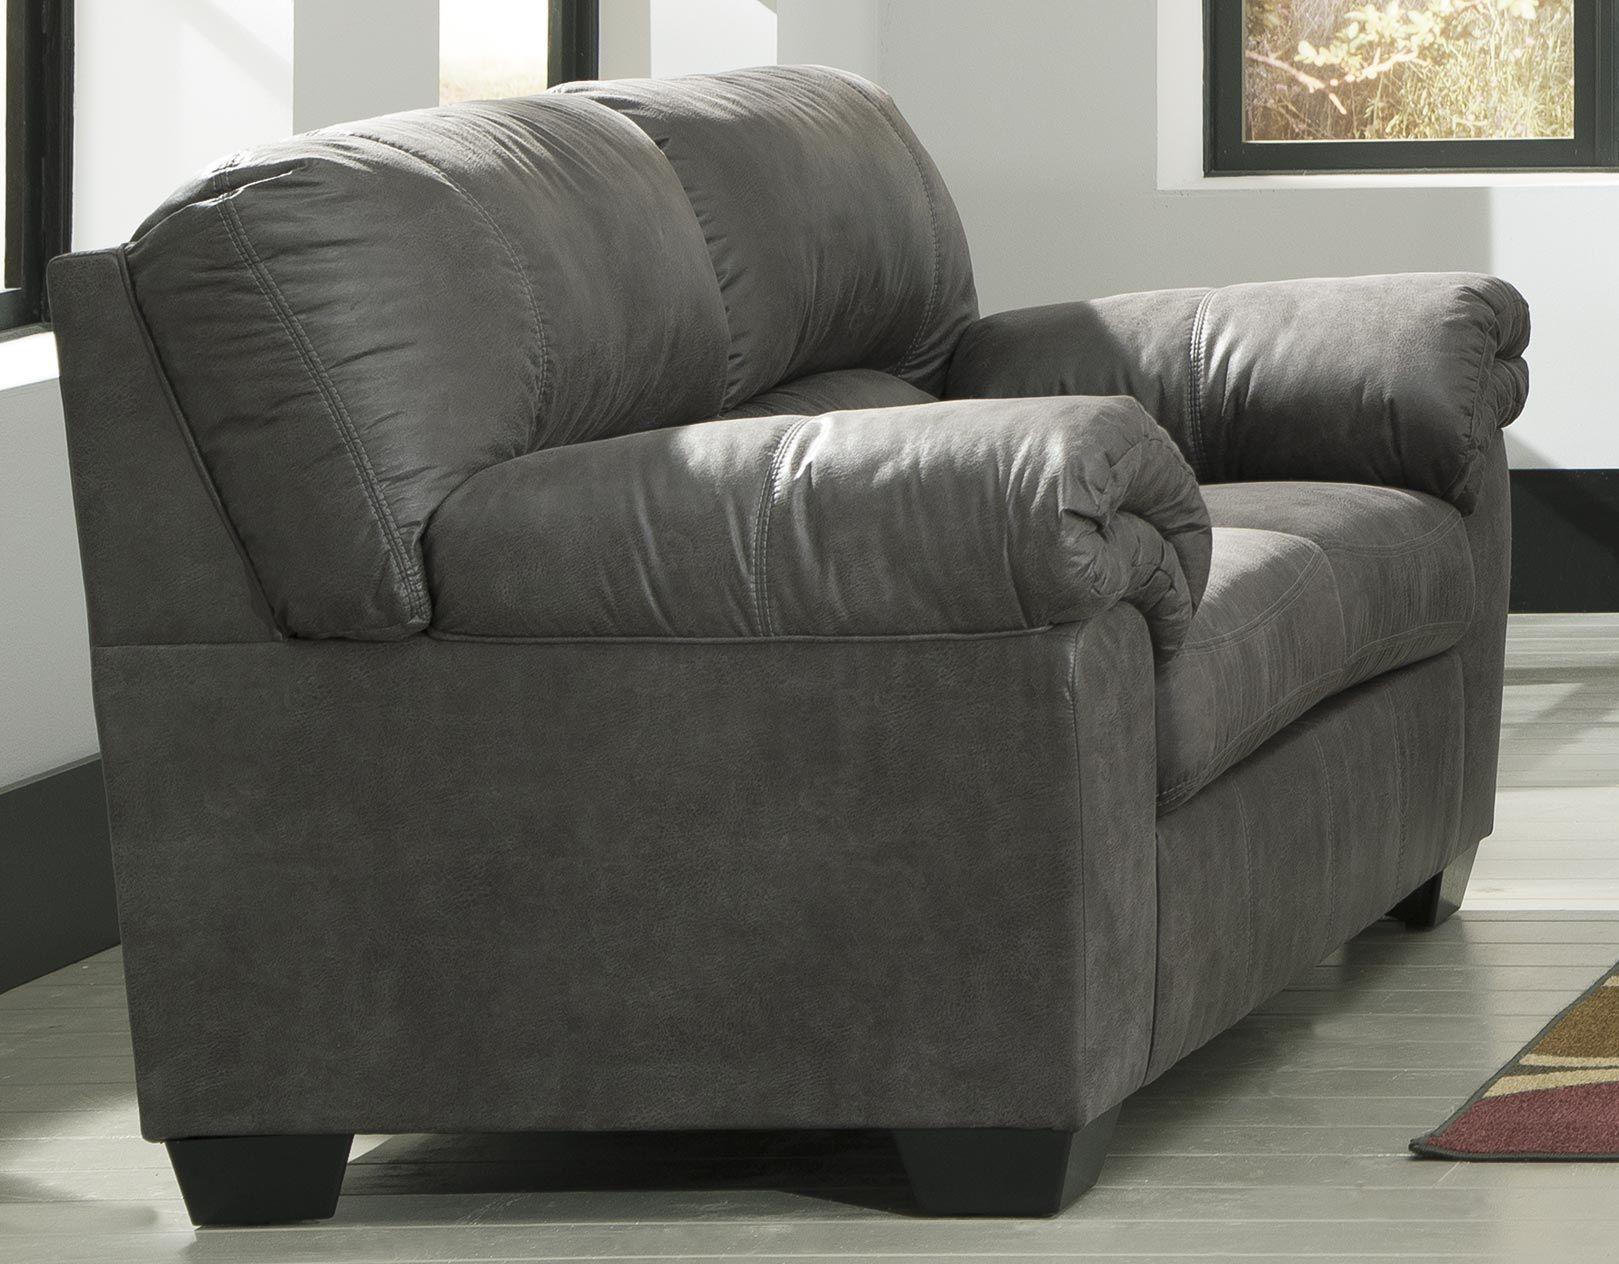 Bladen Loveseat Slate Sofa Loveseat Set Loft Furniture Loveseat Sofa